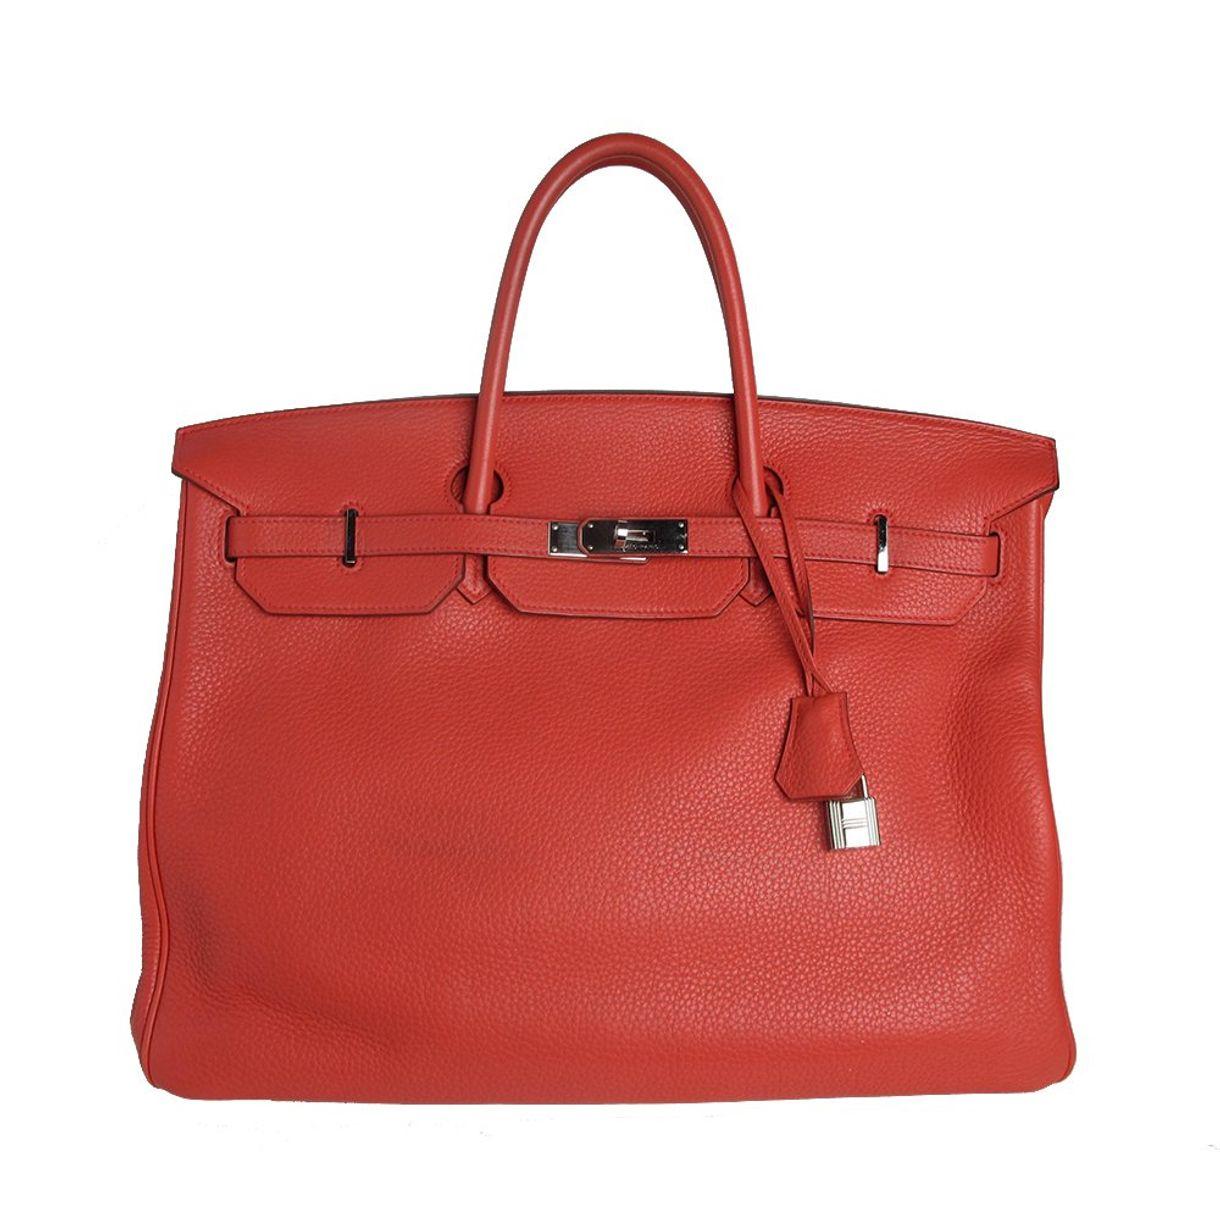 Bolsa-Hermes-Birkin-Coral